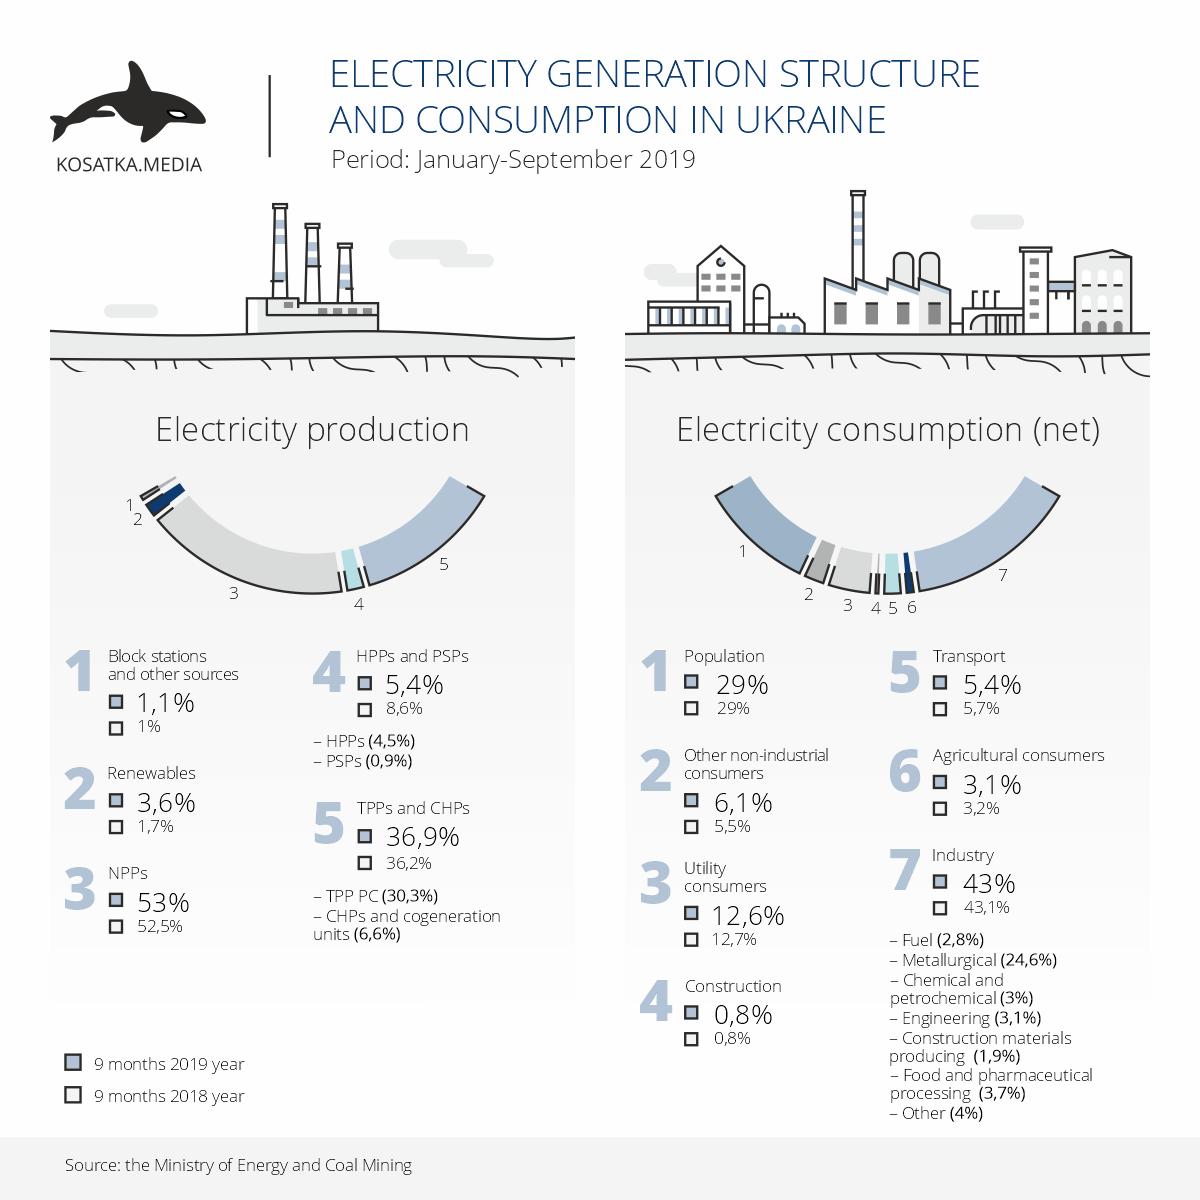 Electricity generation structure, electricity consumpsion structure